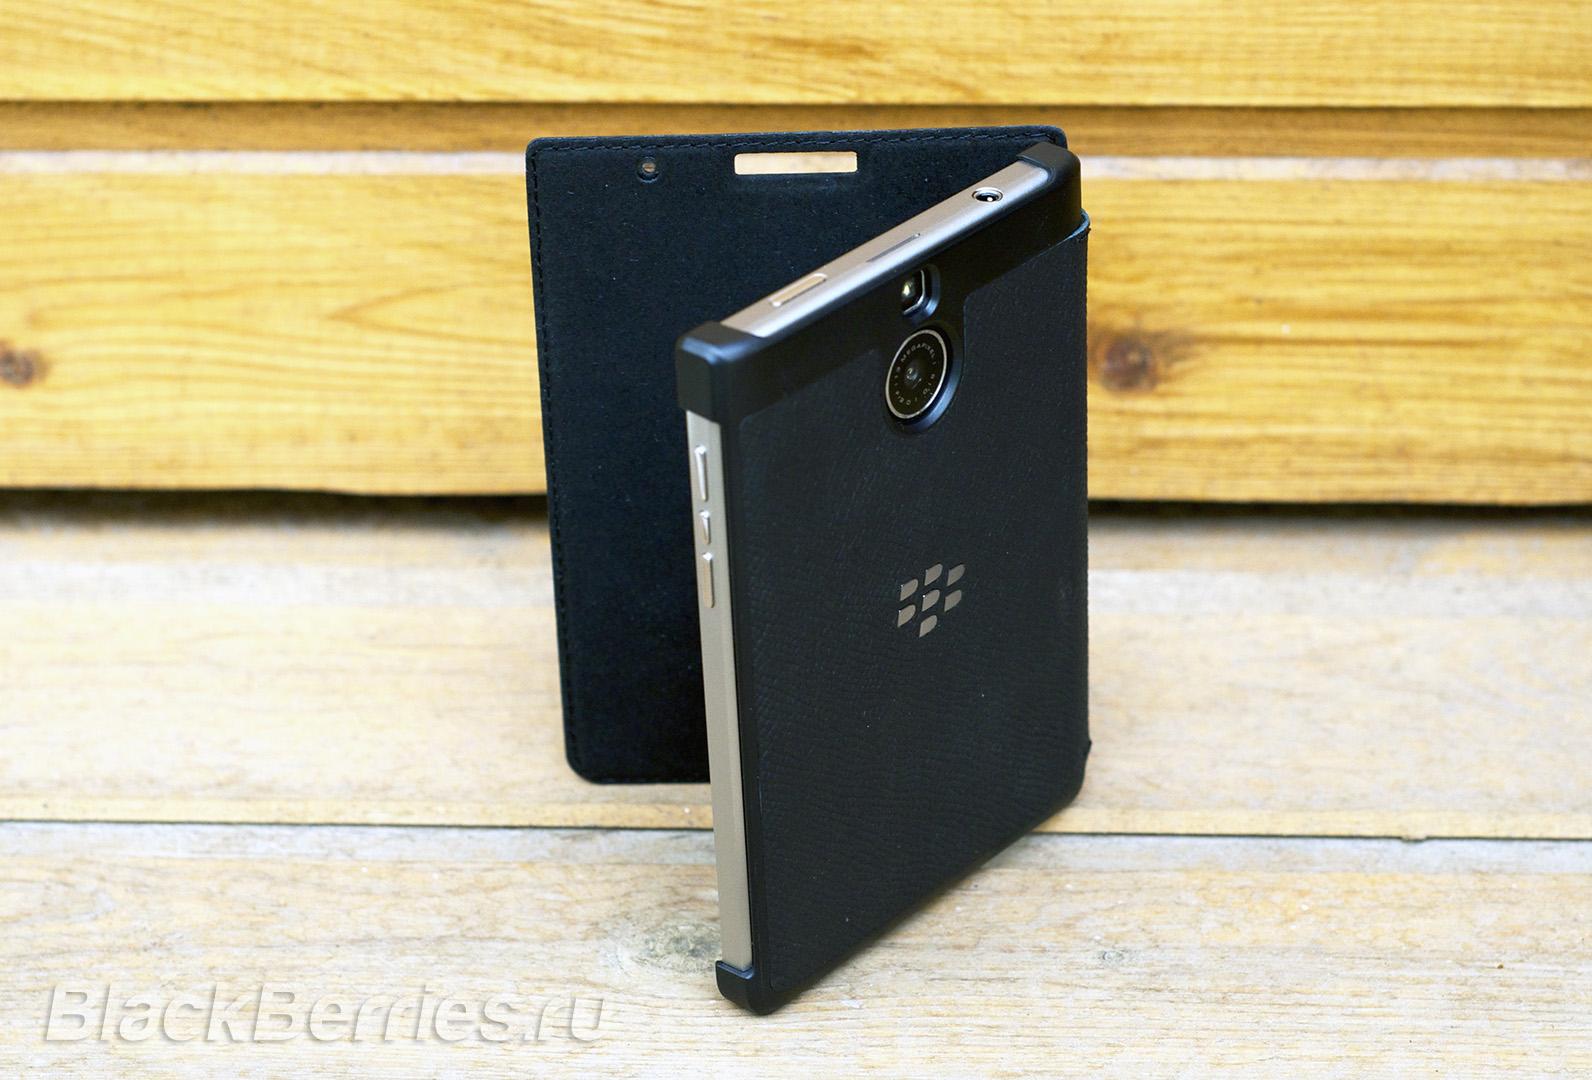 BlackBerry-Passport-Silver-Edition-Cases-21